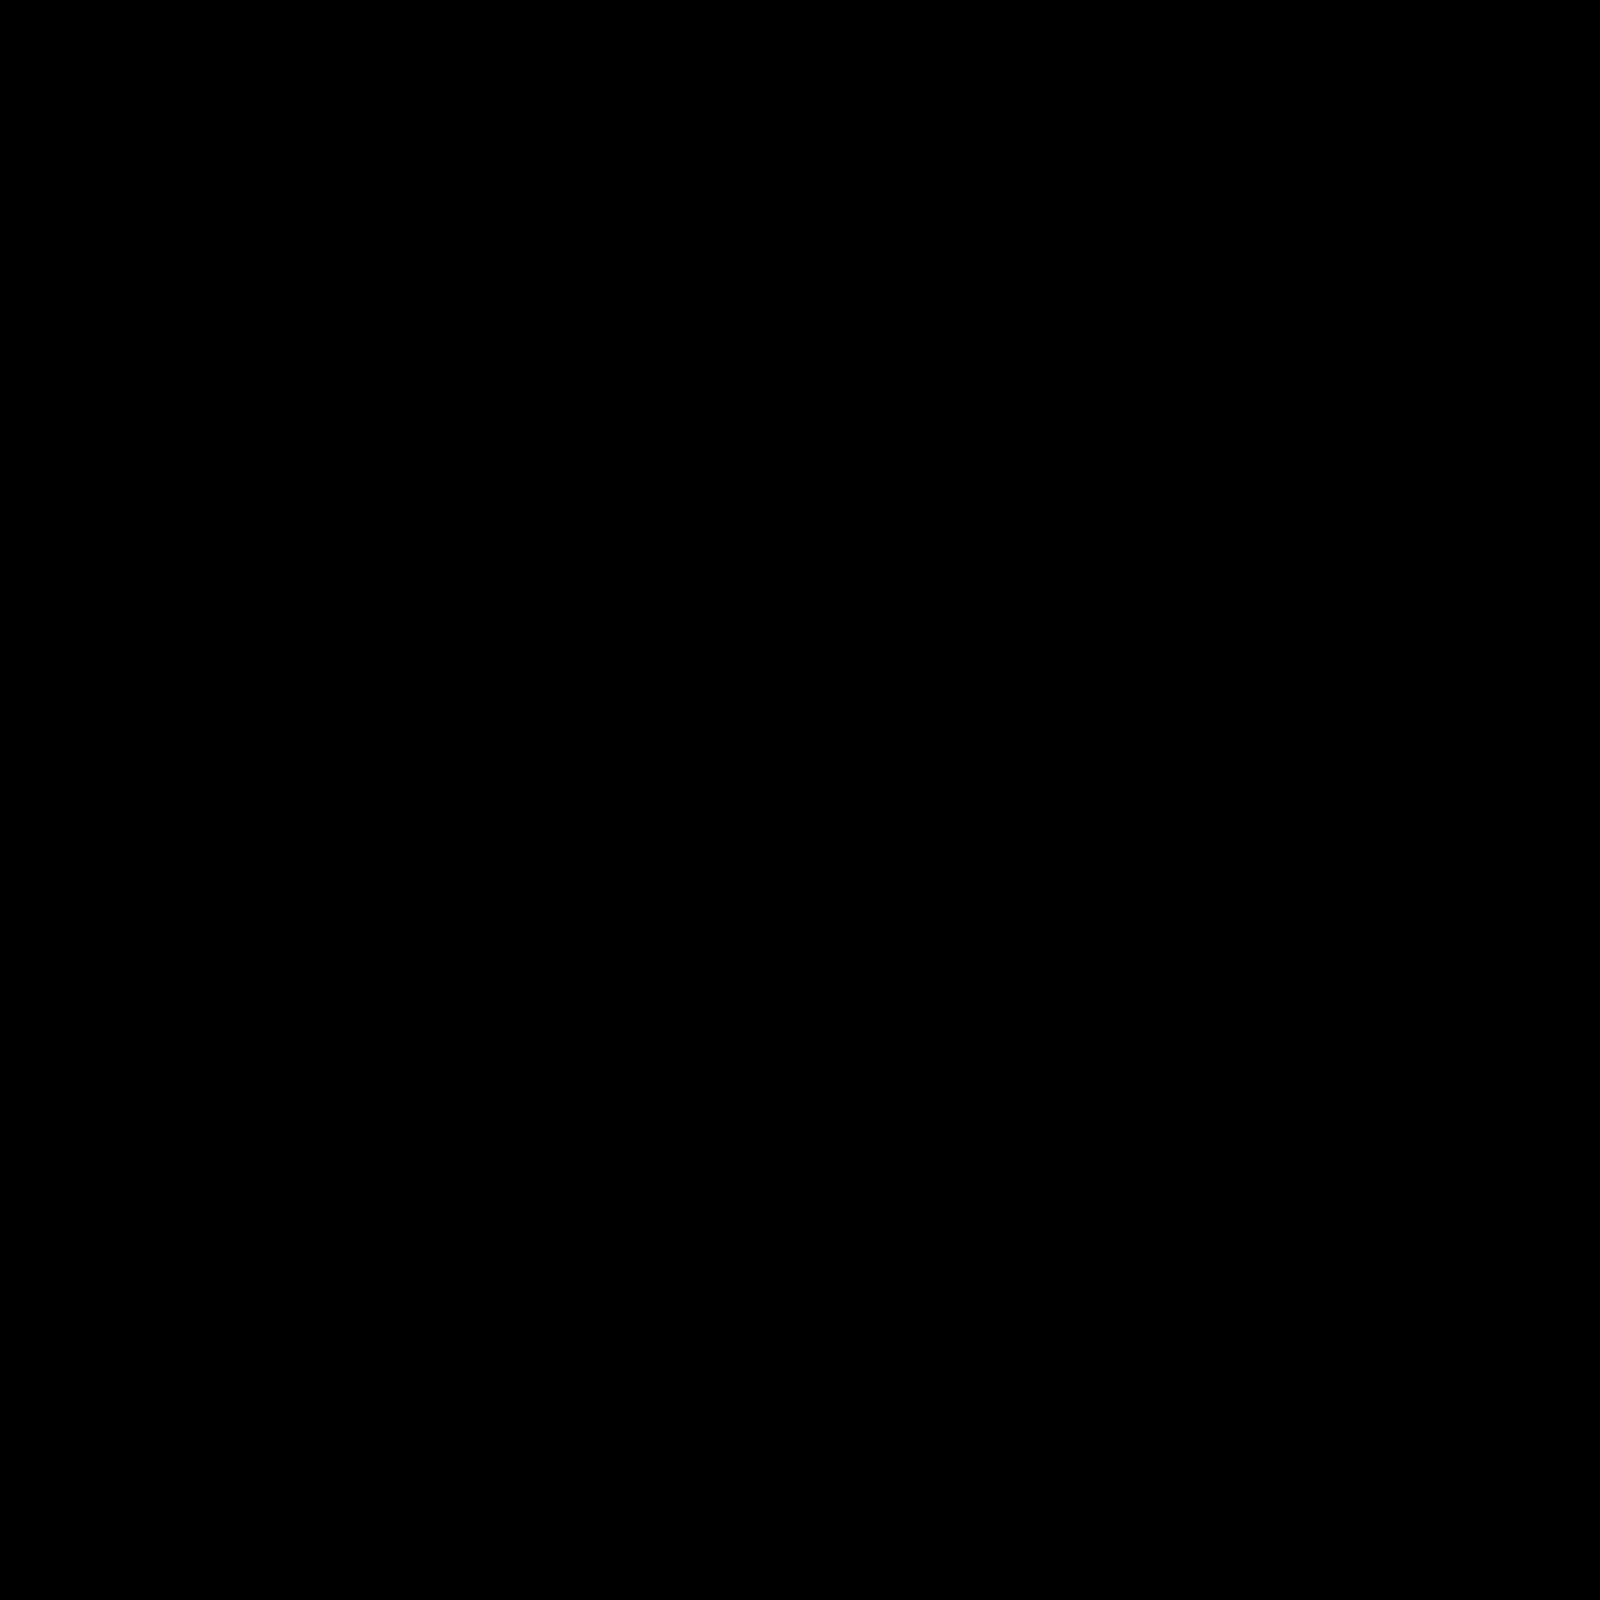 Nicht verifiziertes Konto icon